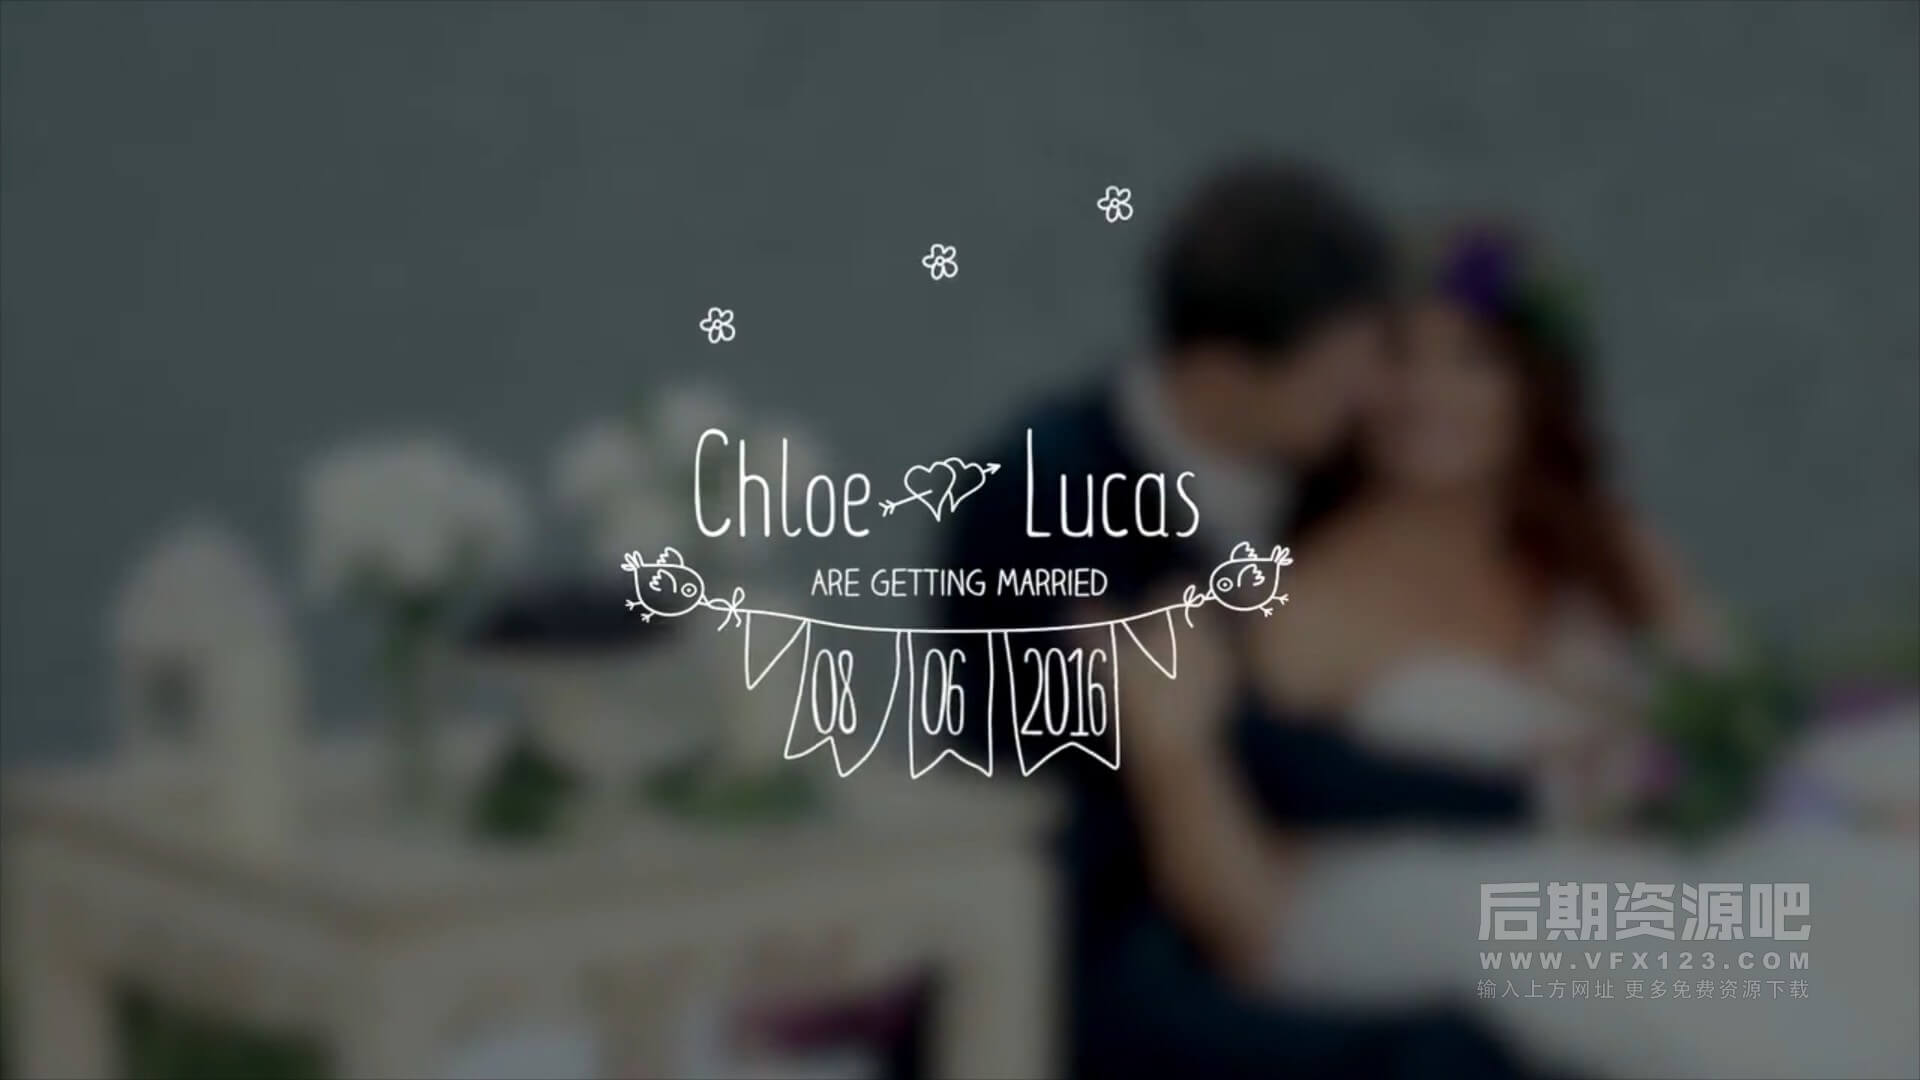 FCPX标题插件 8个卡通手绘婚礼人名文字标题动画字幕预设 Wedding Titles | MAC影视后期资源站